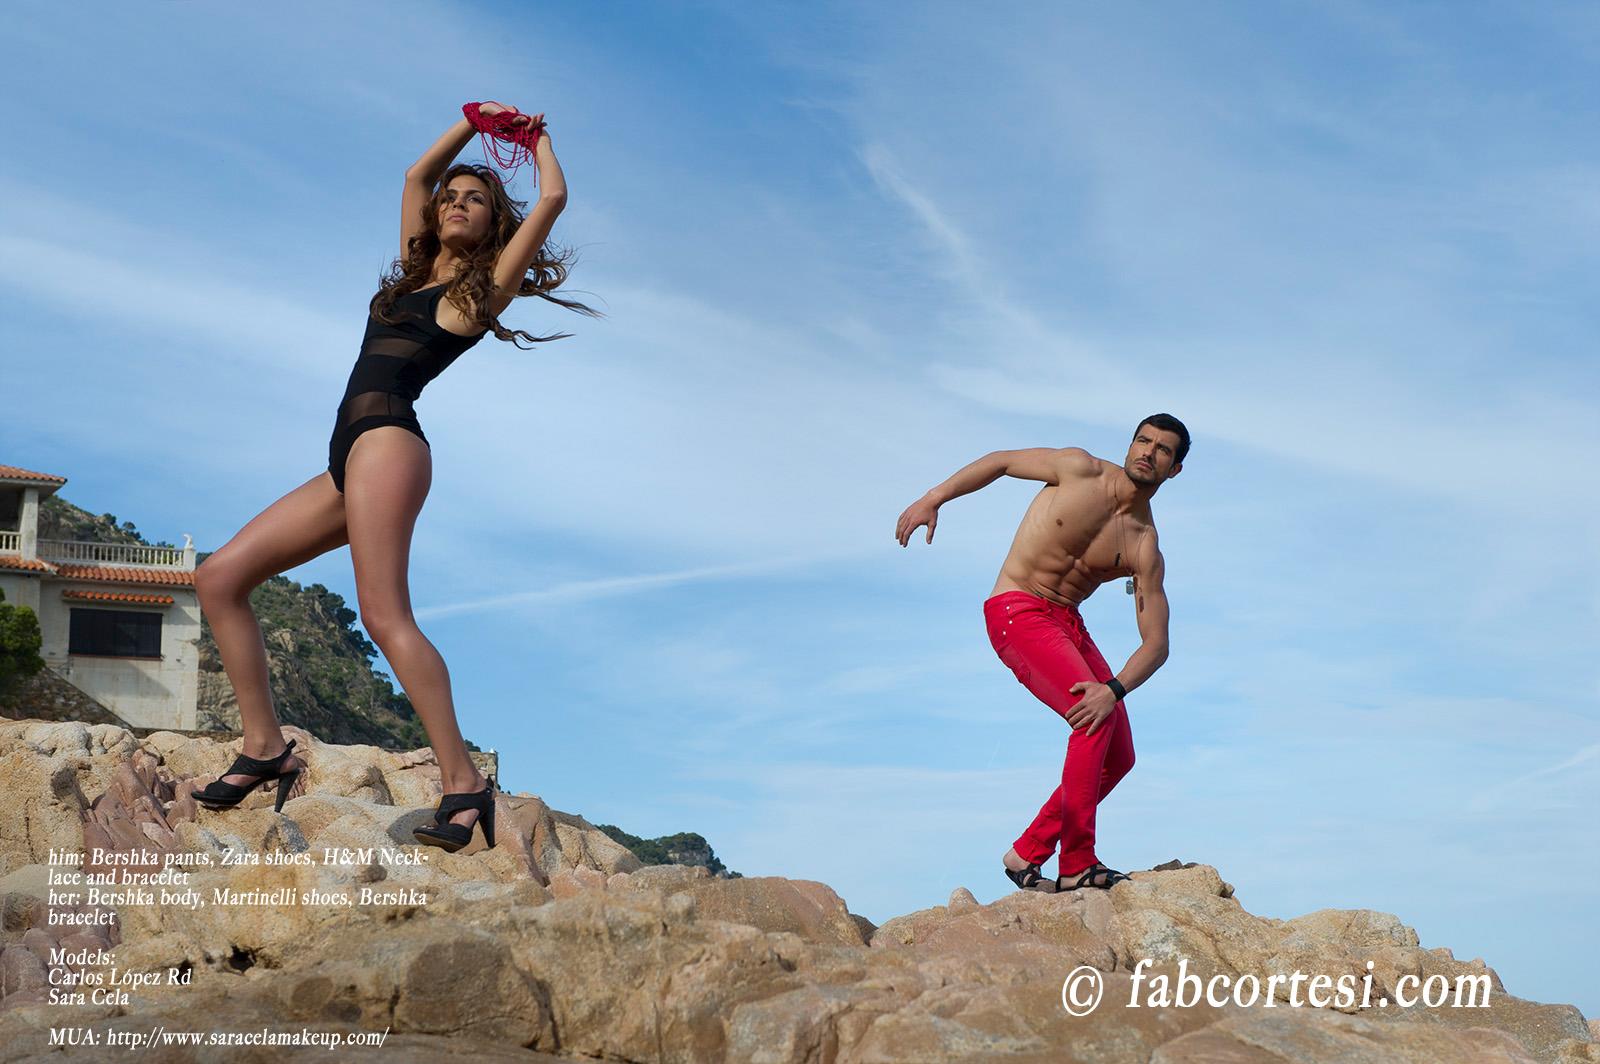 him: Bershka pants, Zara shoes, H&M Necklaceher: Bershka body, Martinelli shoes, Bershka braceletModels: Carlos López RdSara CelaMUA: http://www.saracelamakeup.com/